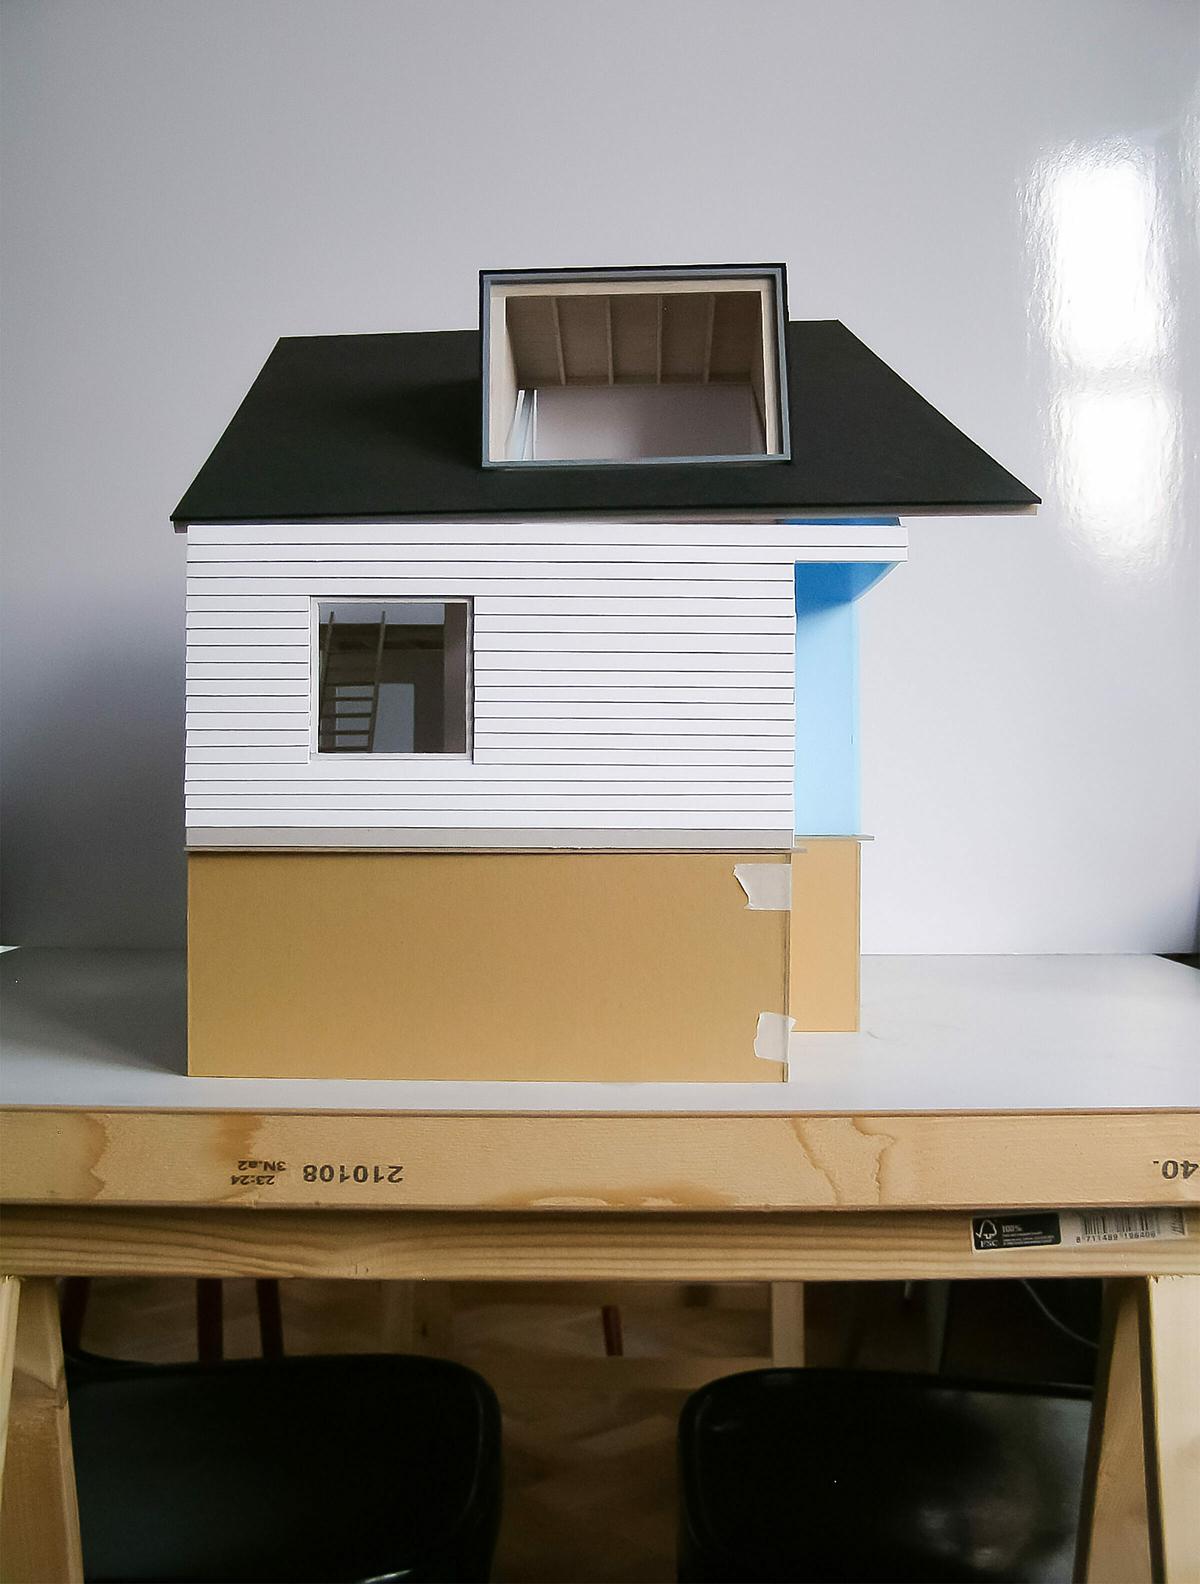 LDS Ra Vlieland maquette